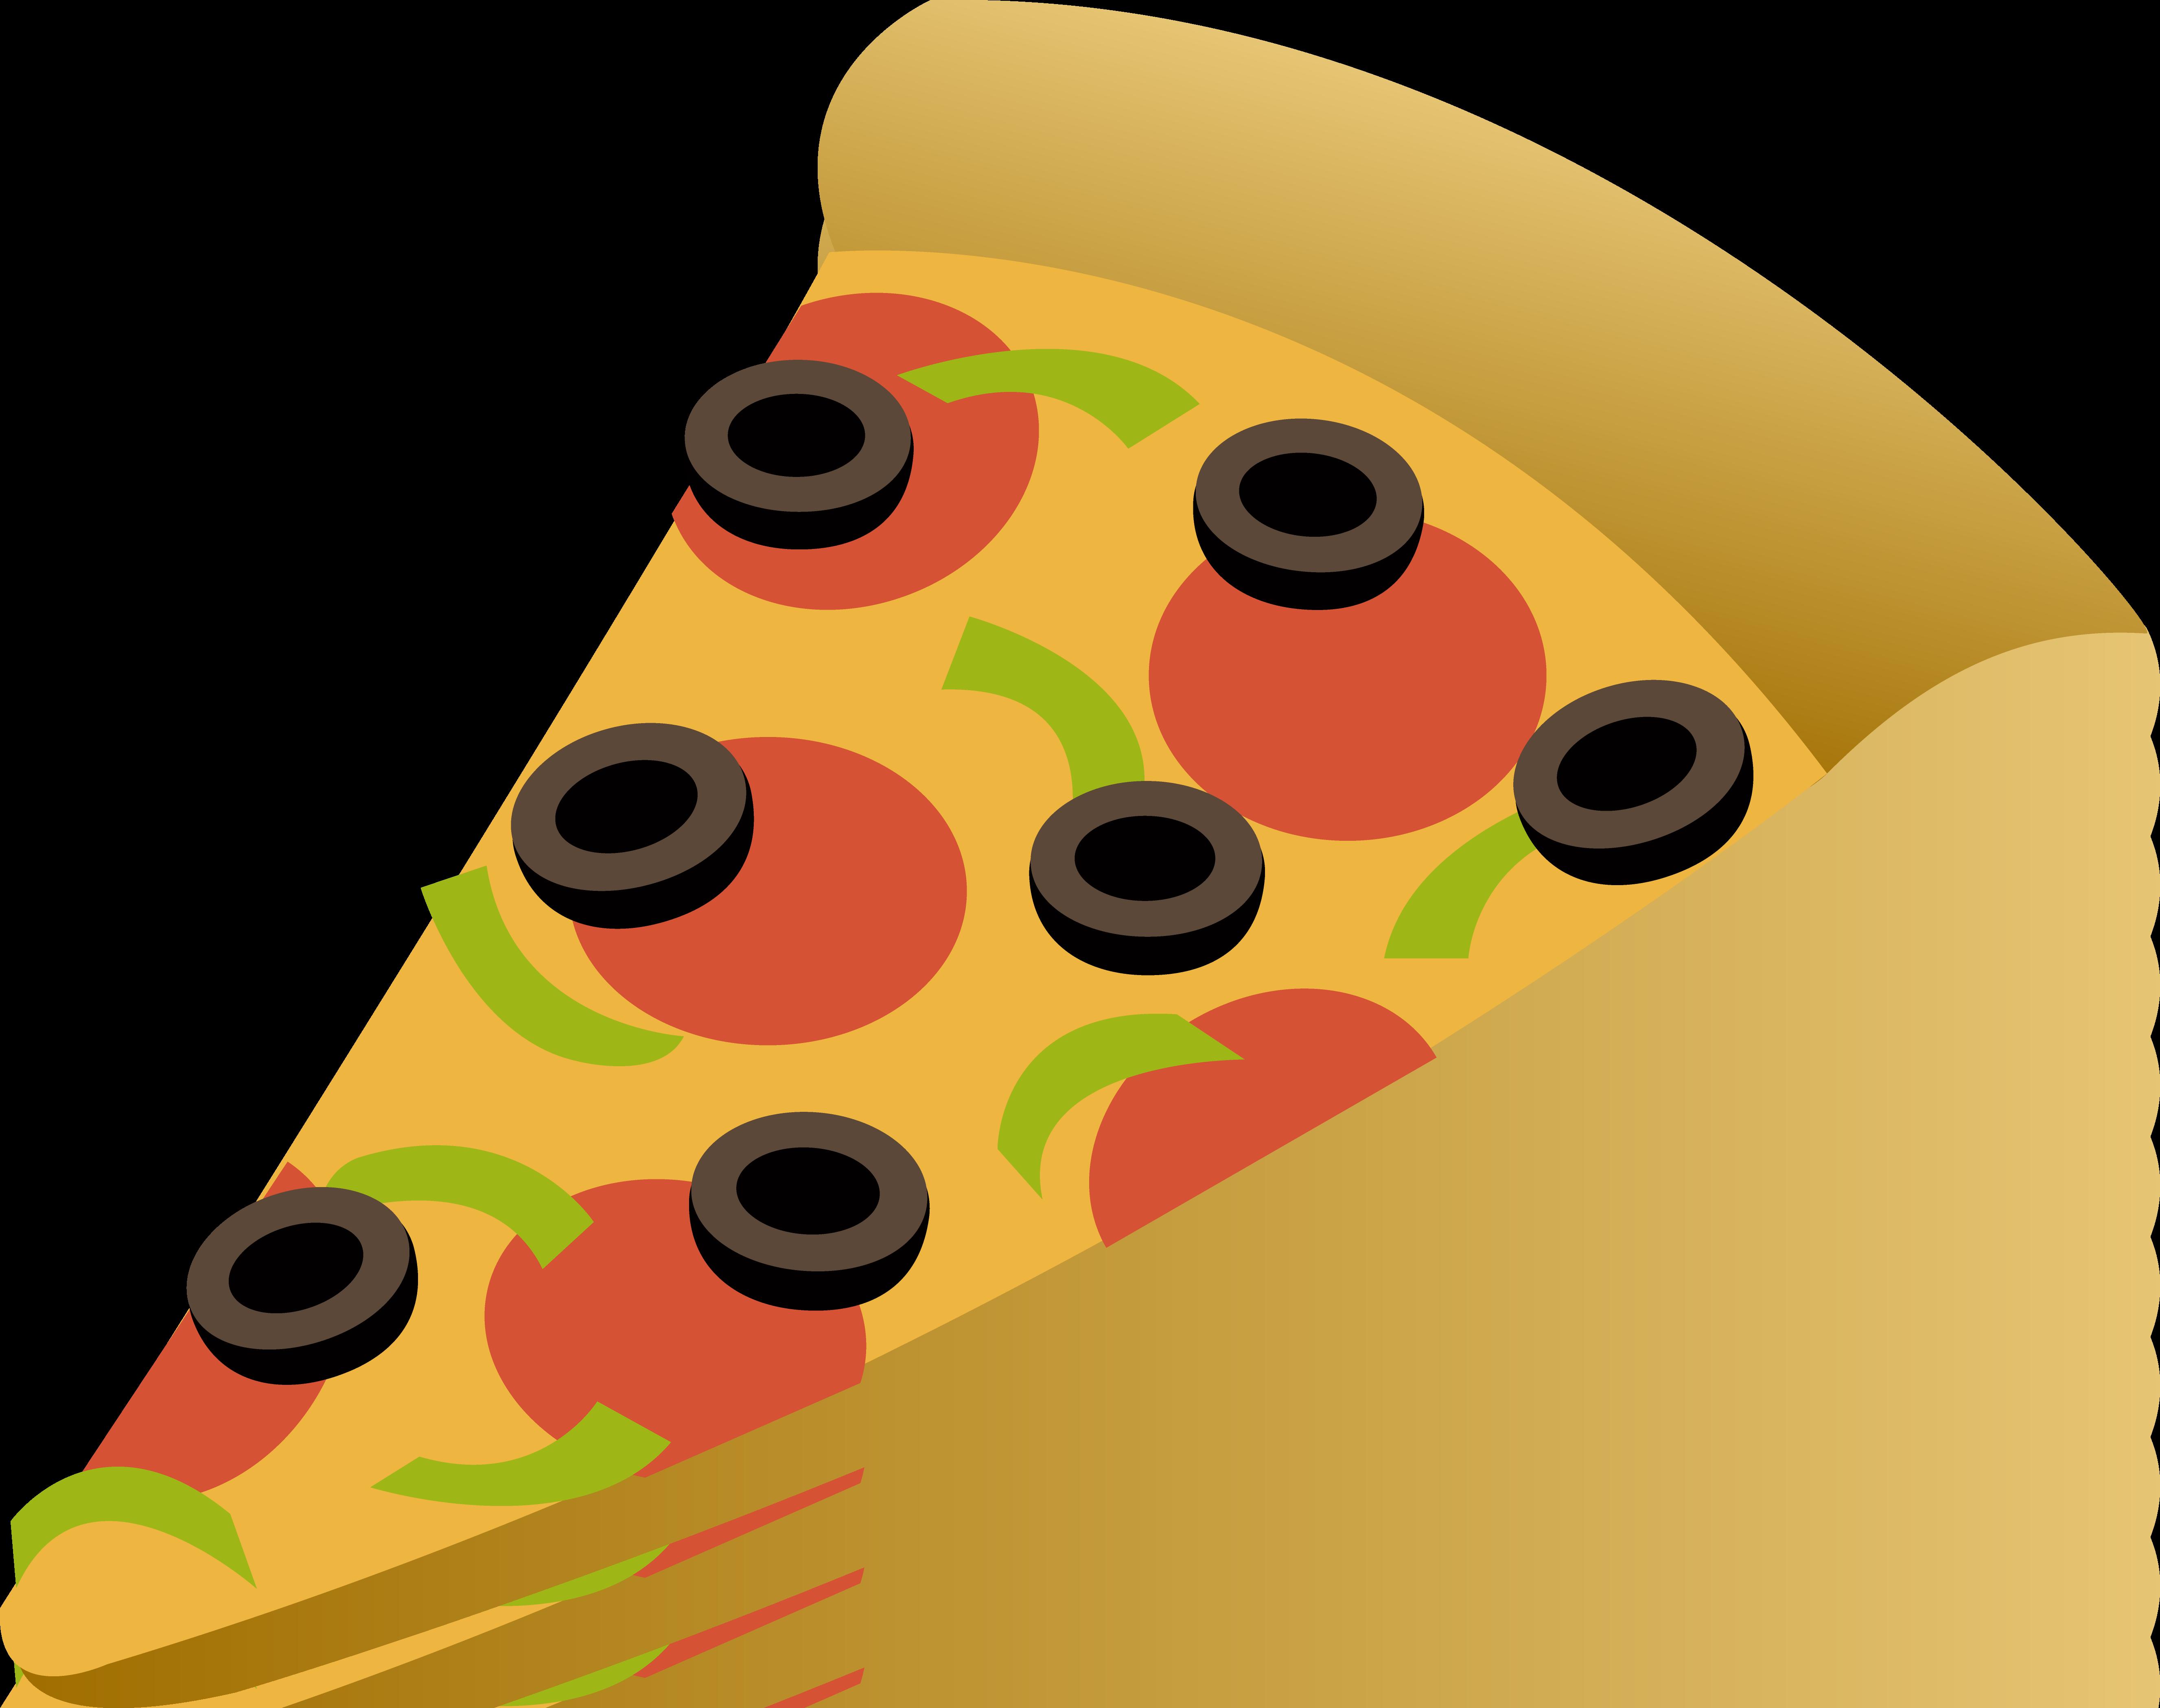 5307x4197 Pepperoni Pizza Slice Clip Art Clipart Panda